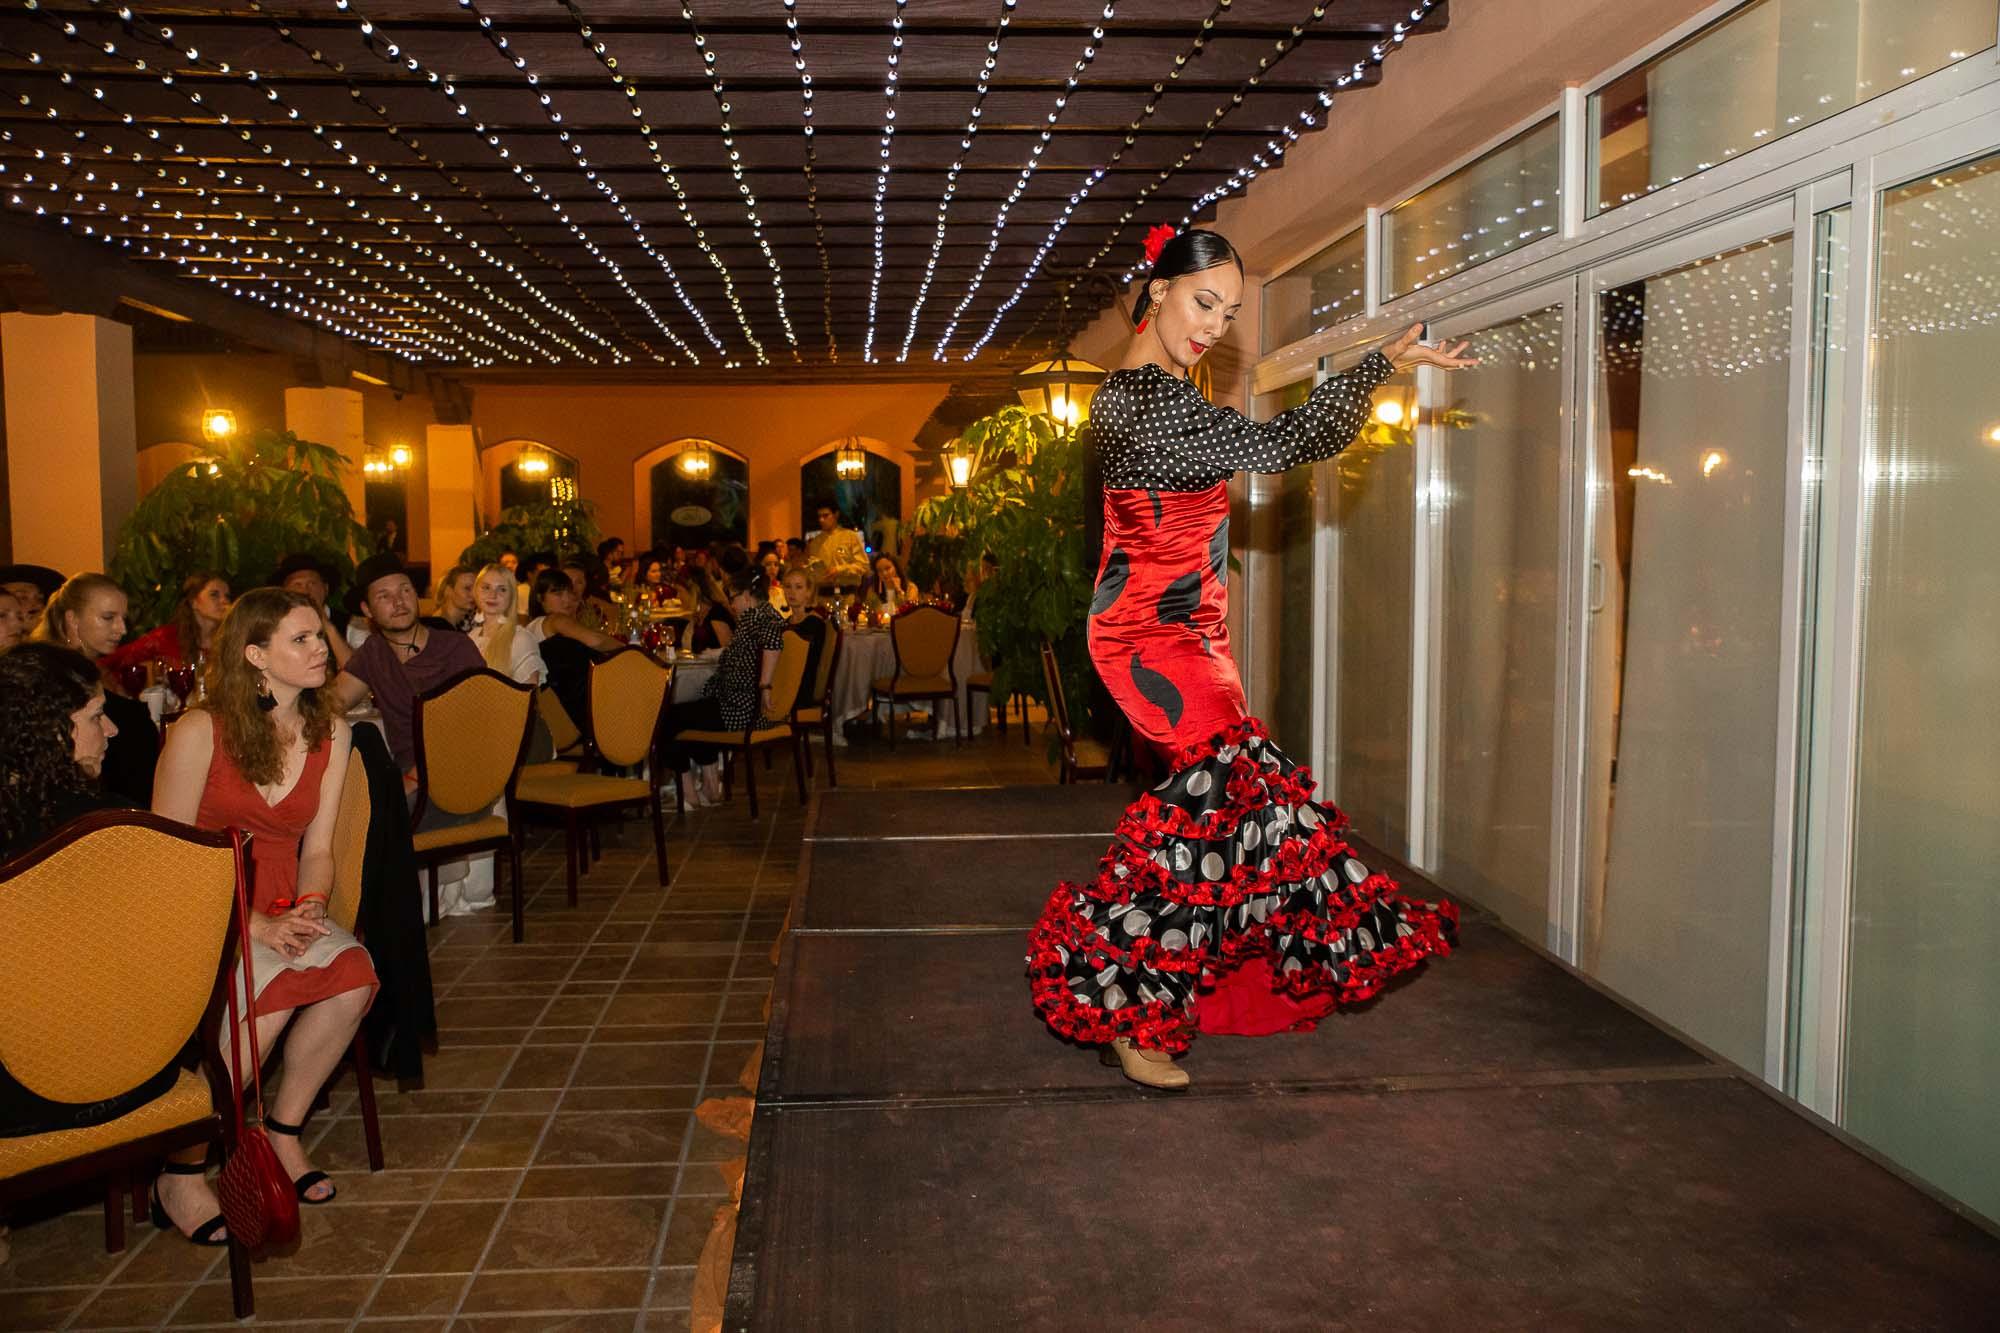 Fotografo espectaculo baile flamenco marbella hotel photographer spectacle dancing event evento - Eventos - 🥇Fotografo de eventos en Marbella Malaga Fuengirola Sotogrande Banalmádena